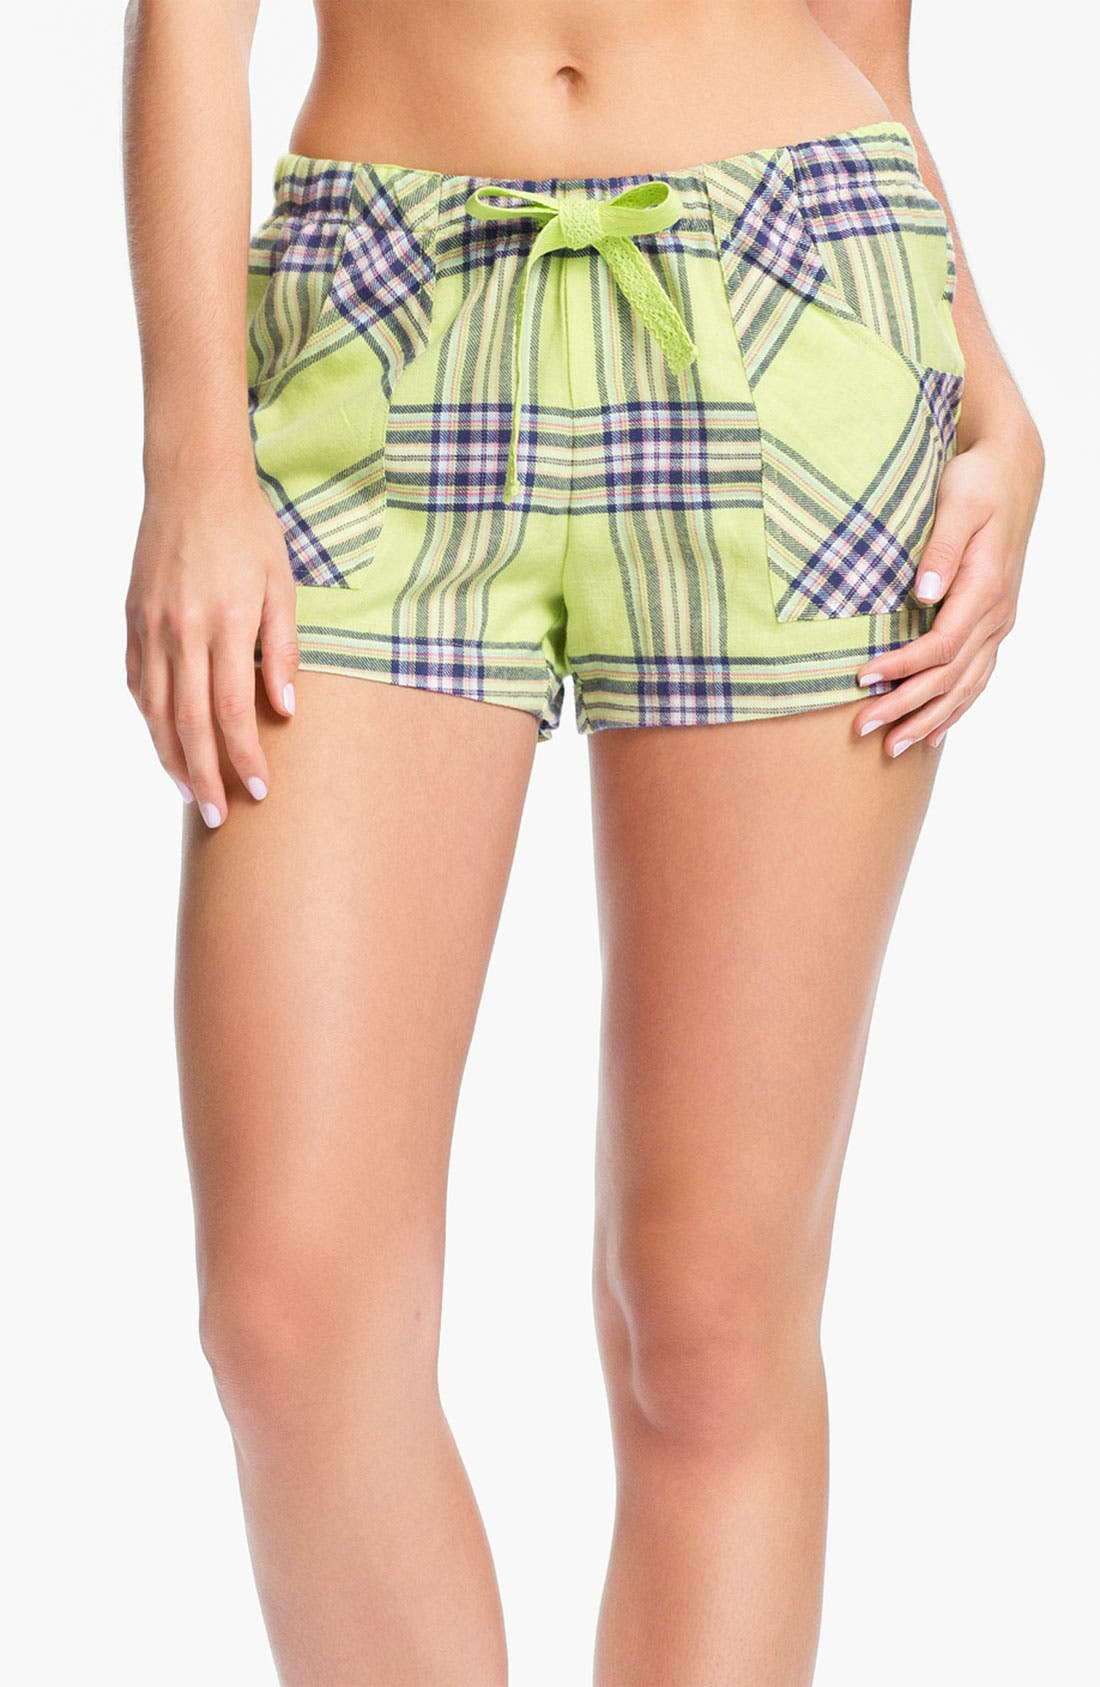 Alternate Image 1 Selected - Make + Model 'Cozy Time' Flannel Boxer Shorts